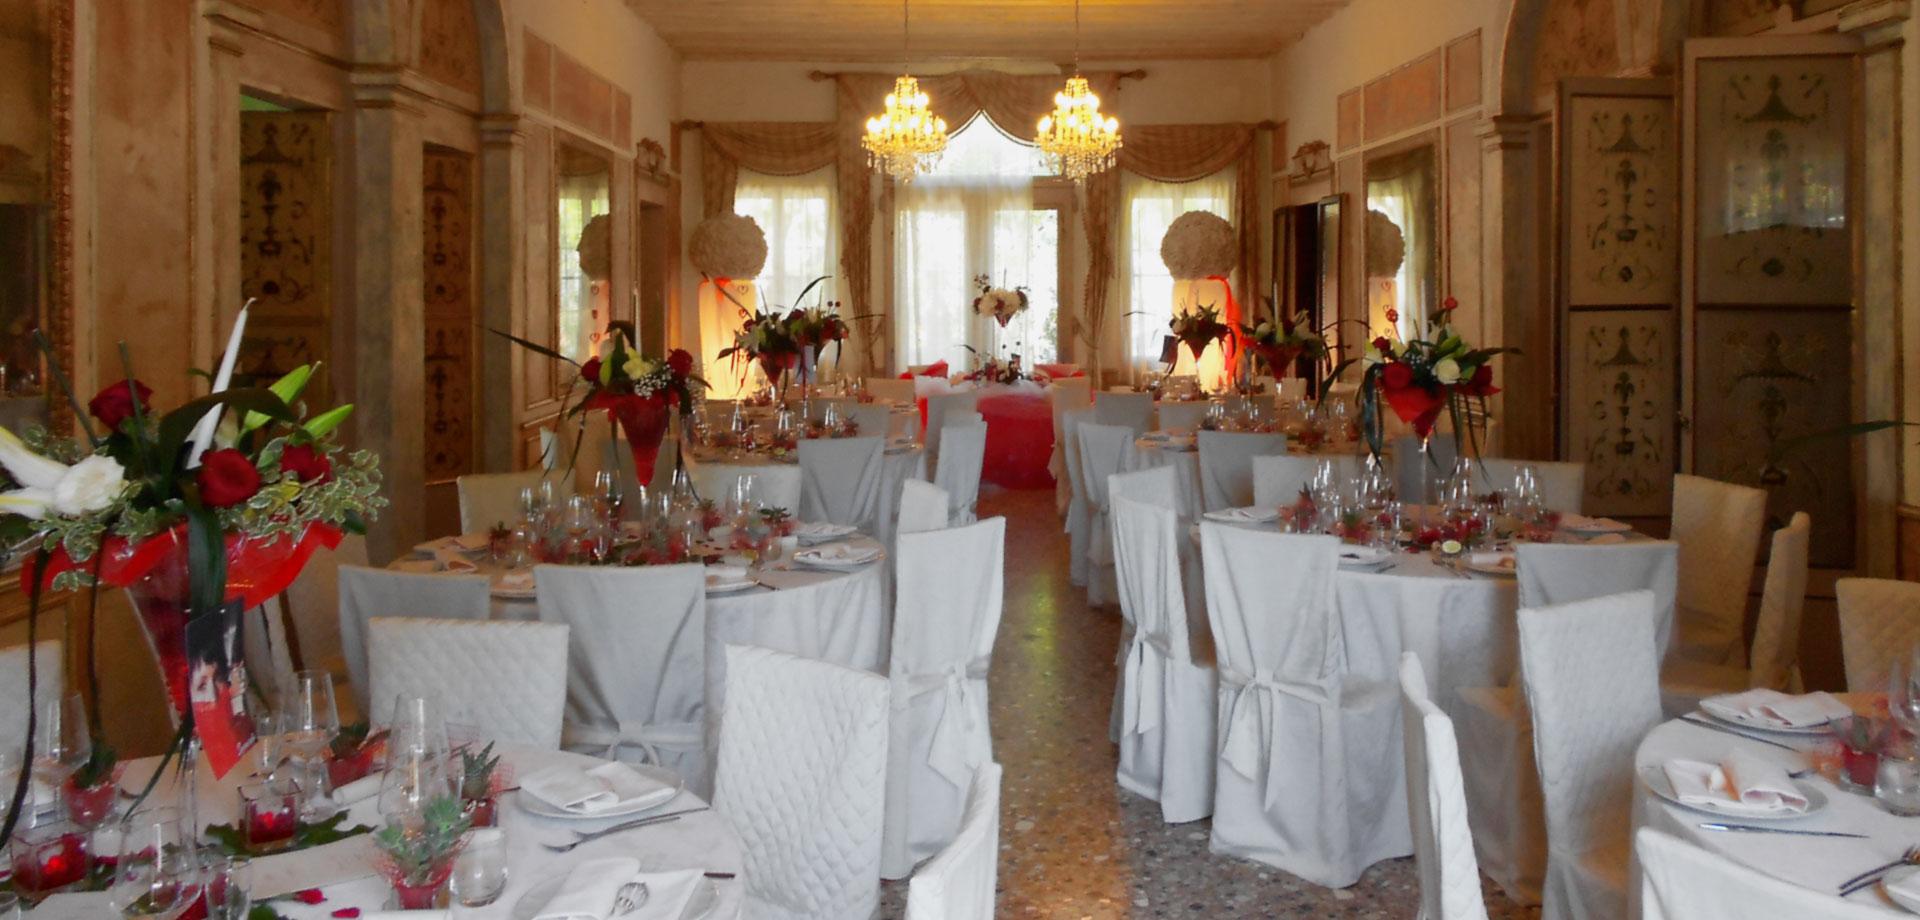 villa-selmi-ristorante-matrimoni-3